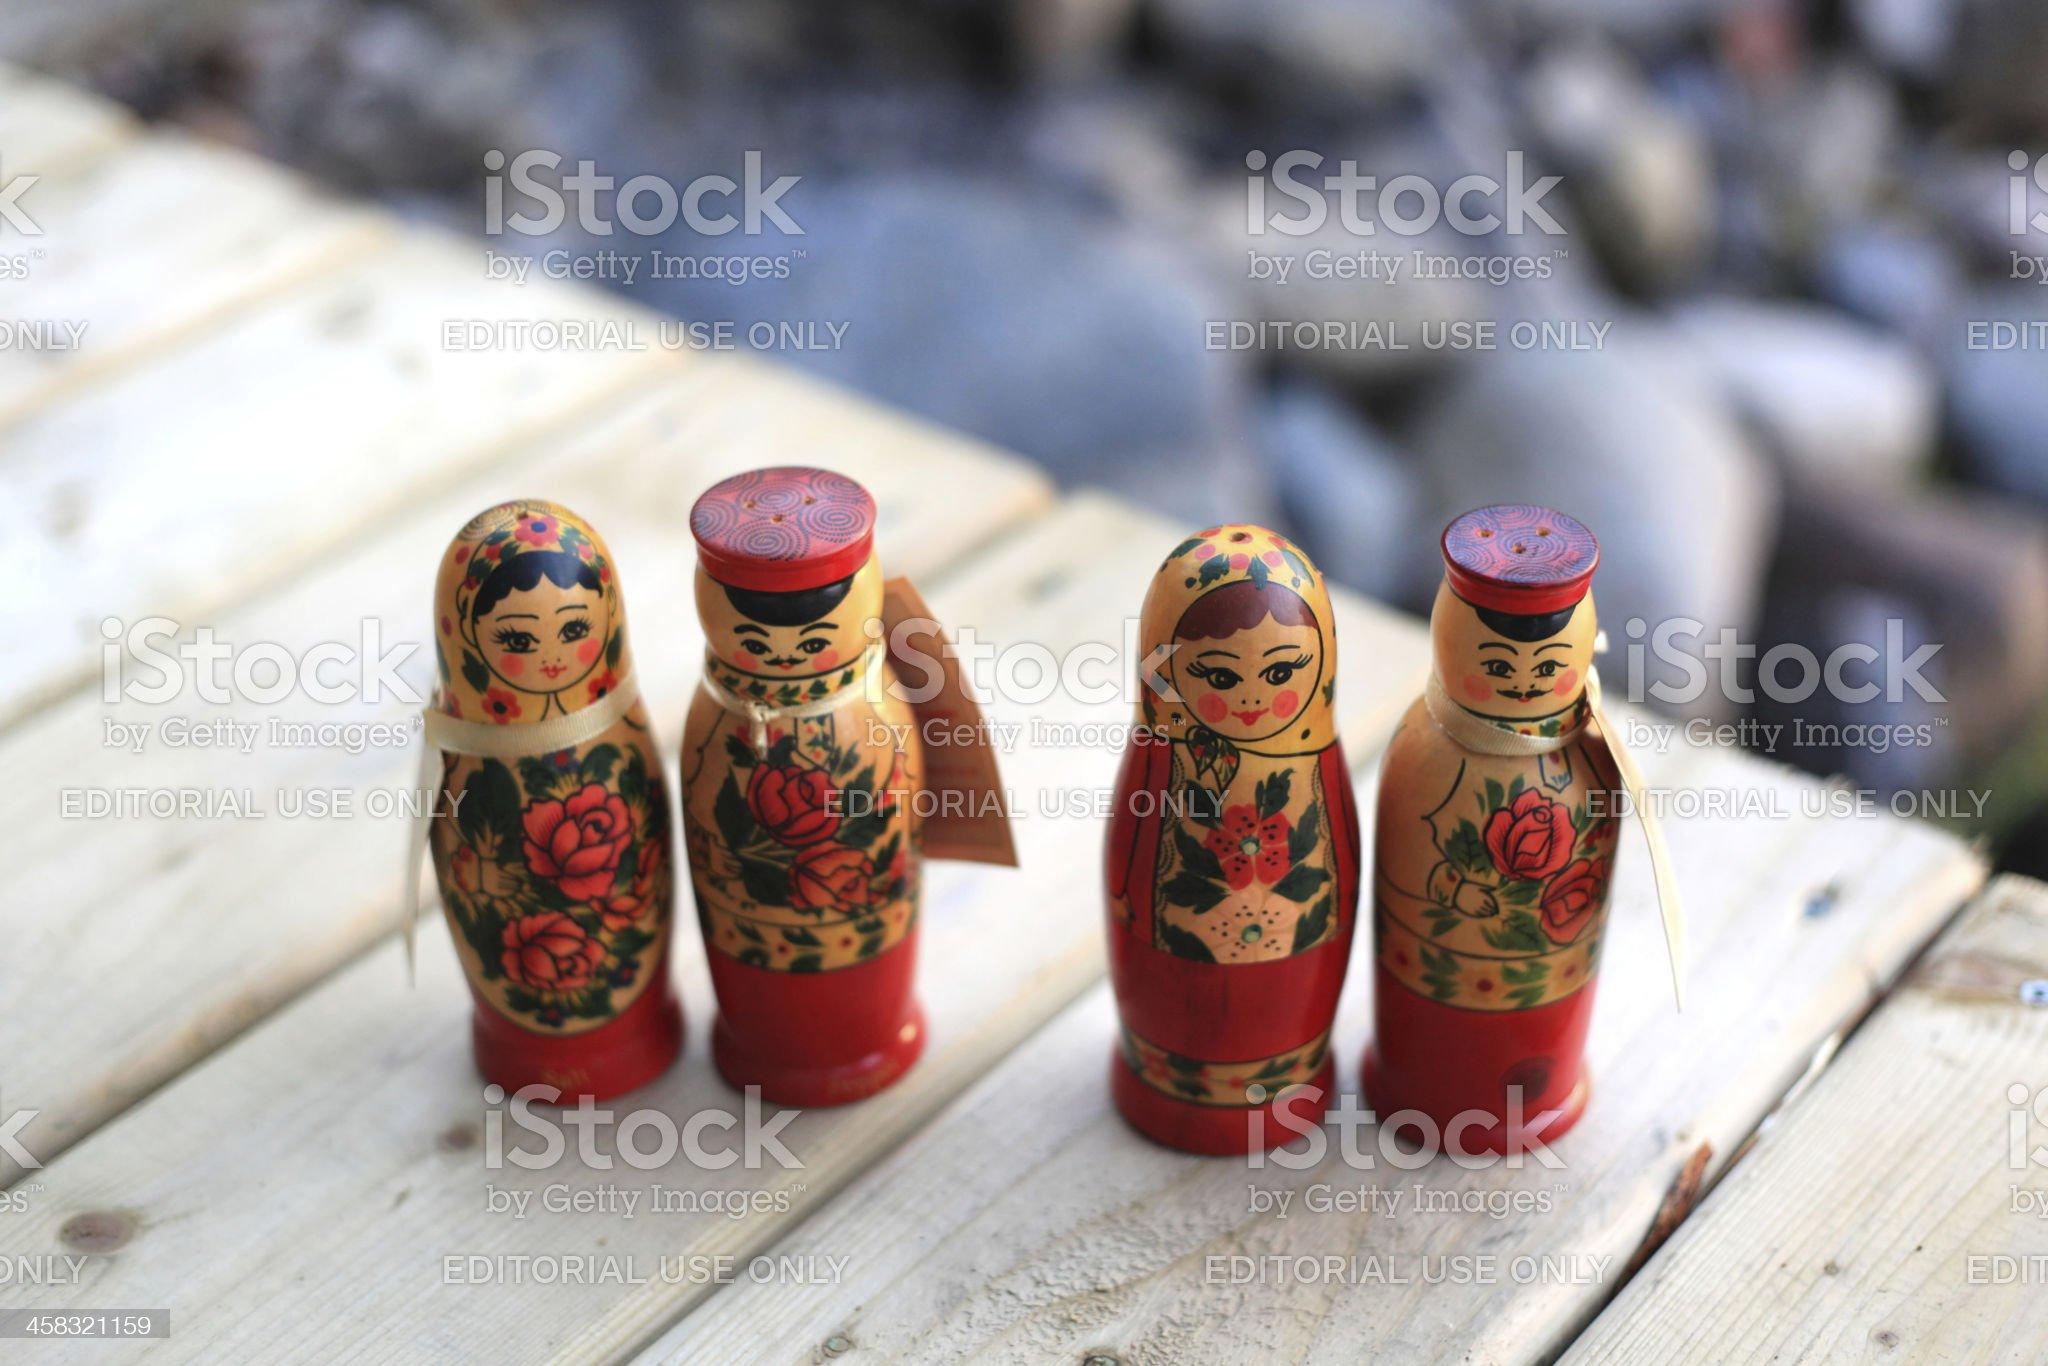 Salt and Pepper Matryoshka Doll royalty-free stock photo